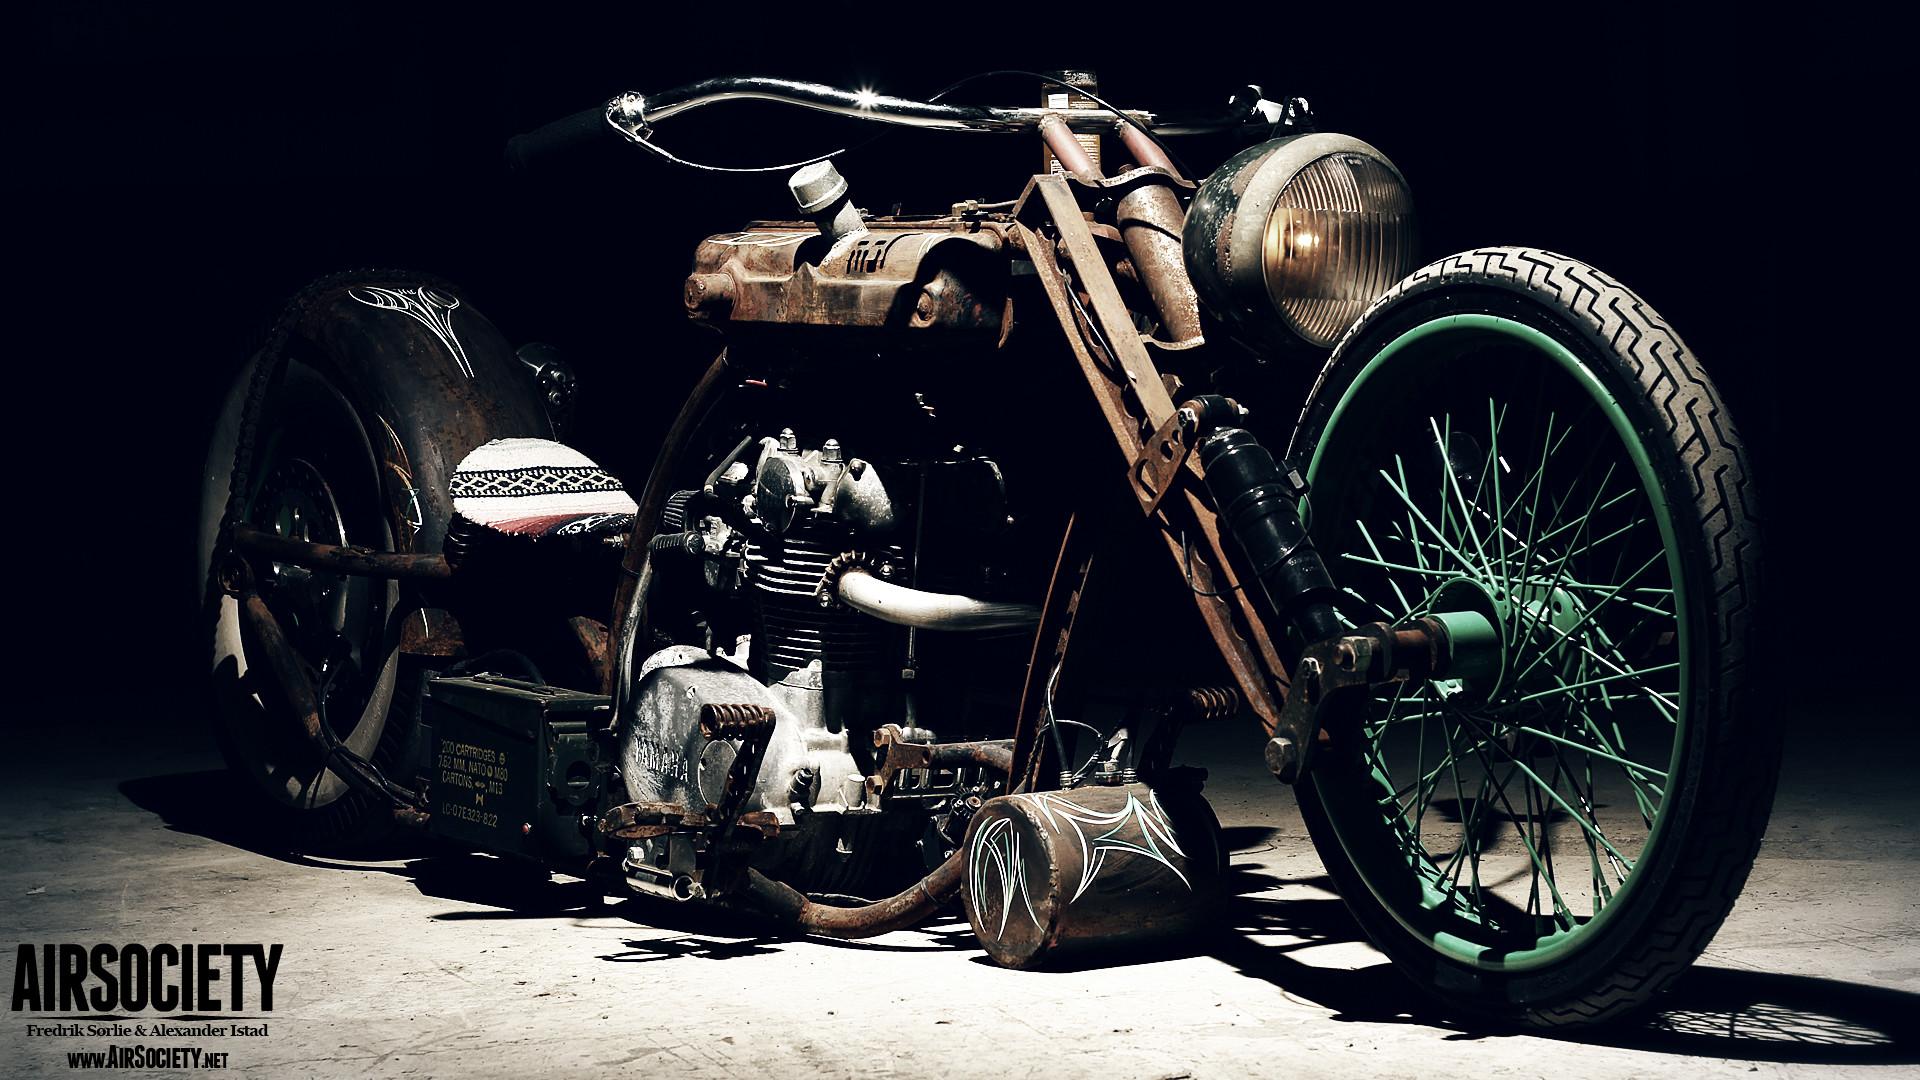 Res: 1920x1080, Bobber Motorcycle Desktop Wallpapers, Bobber Motorcycle Wallpapers